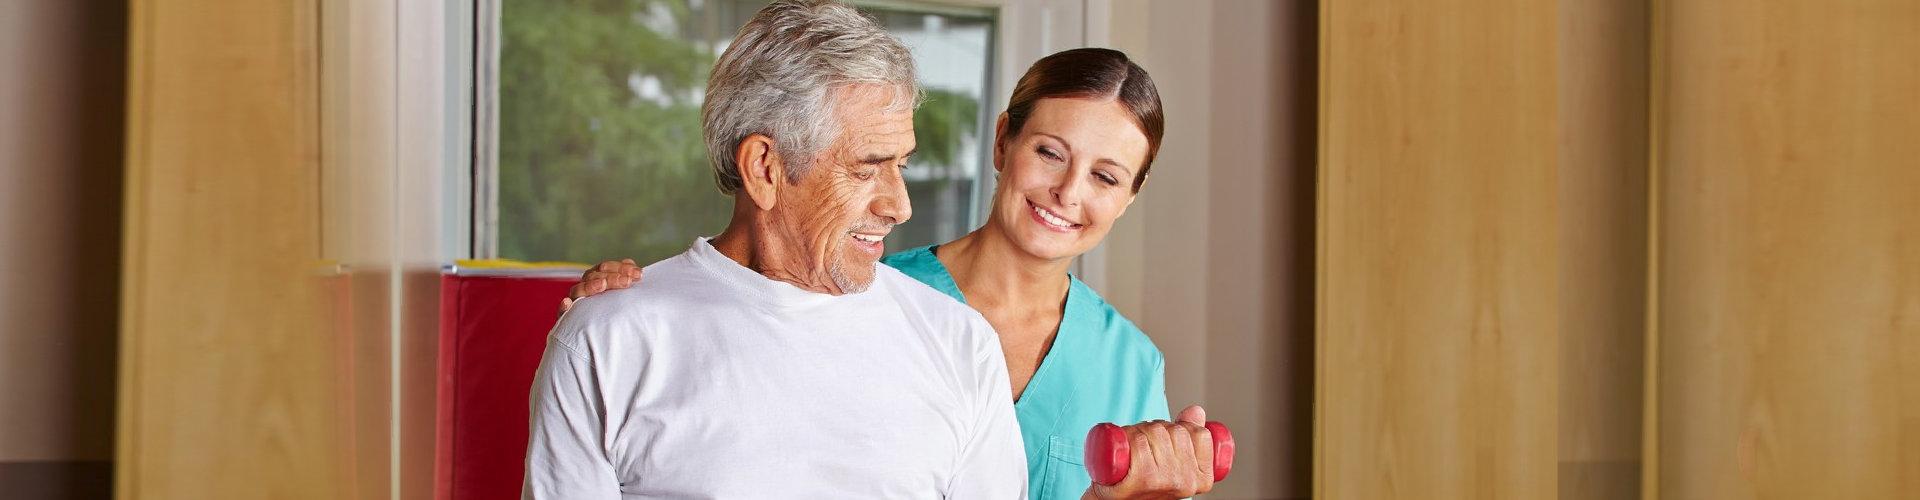 woman hepling senior man to exercise